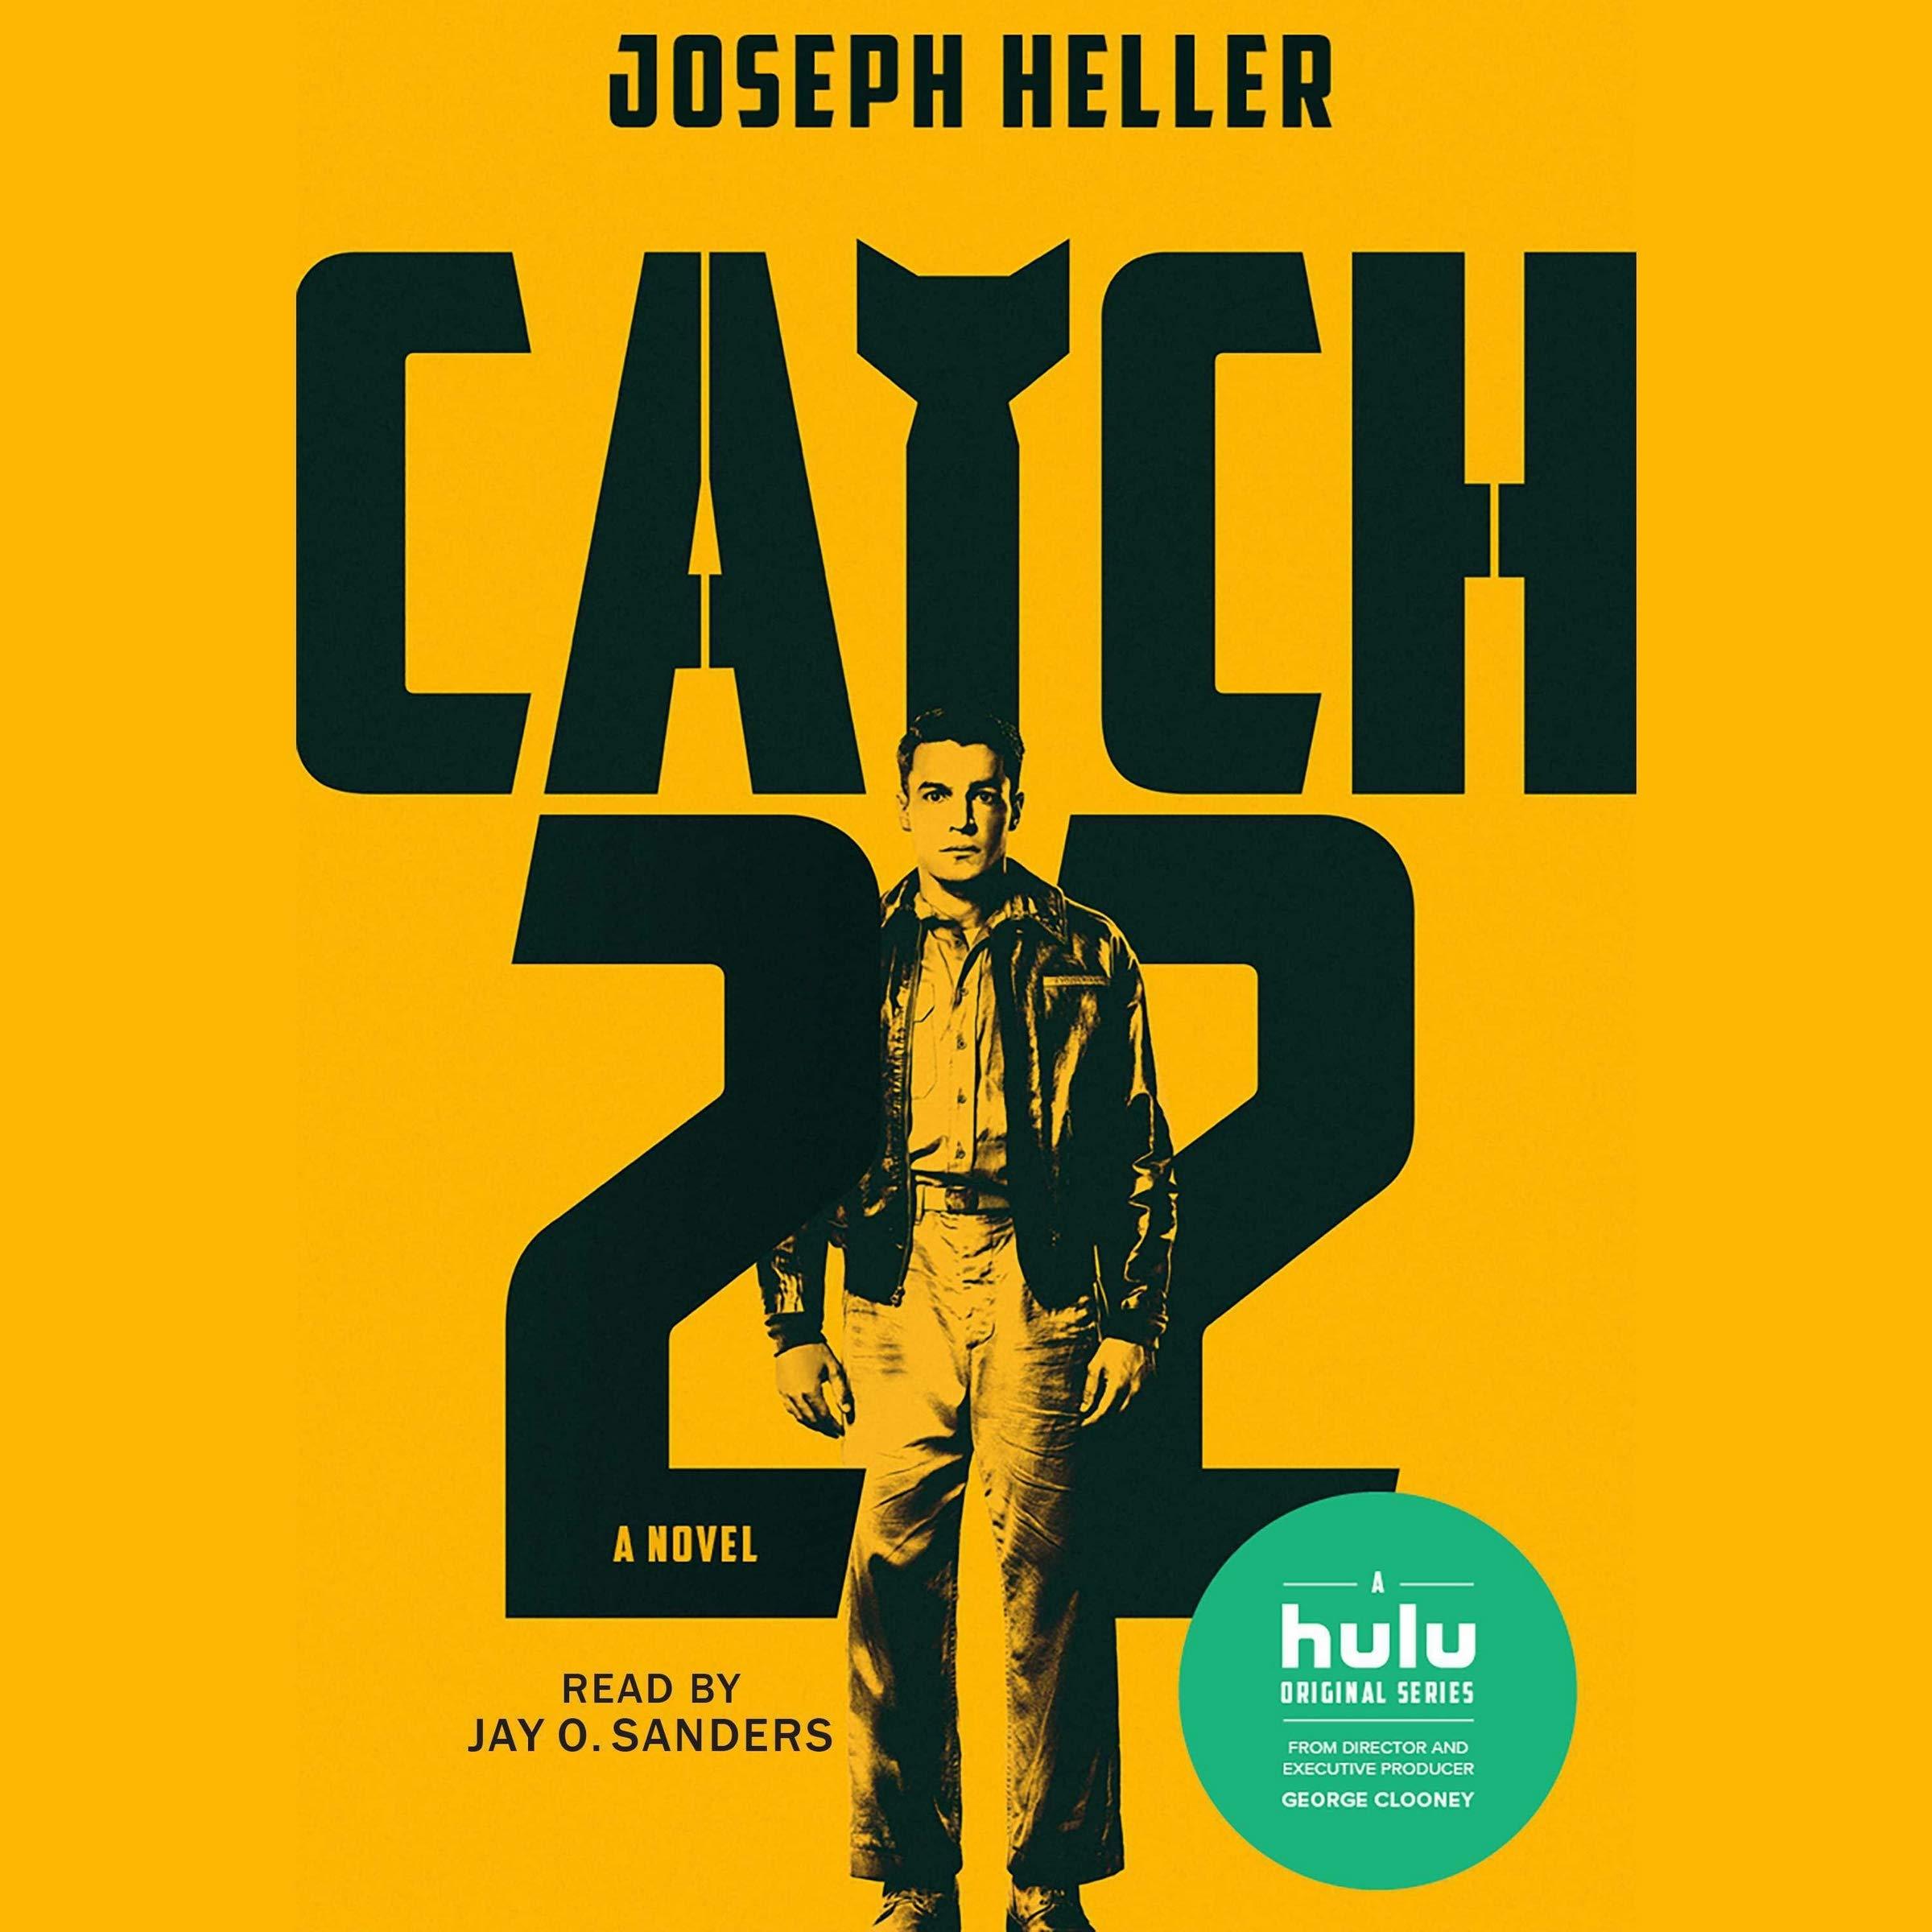 Joseph Heller - Catch-22 BookZyfa